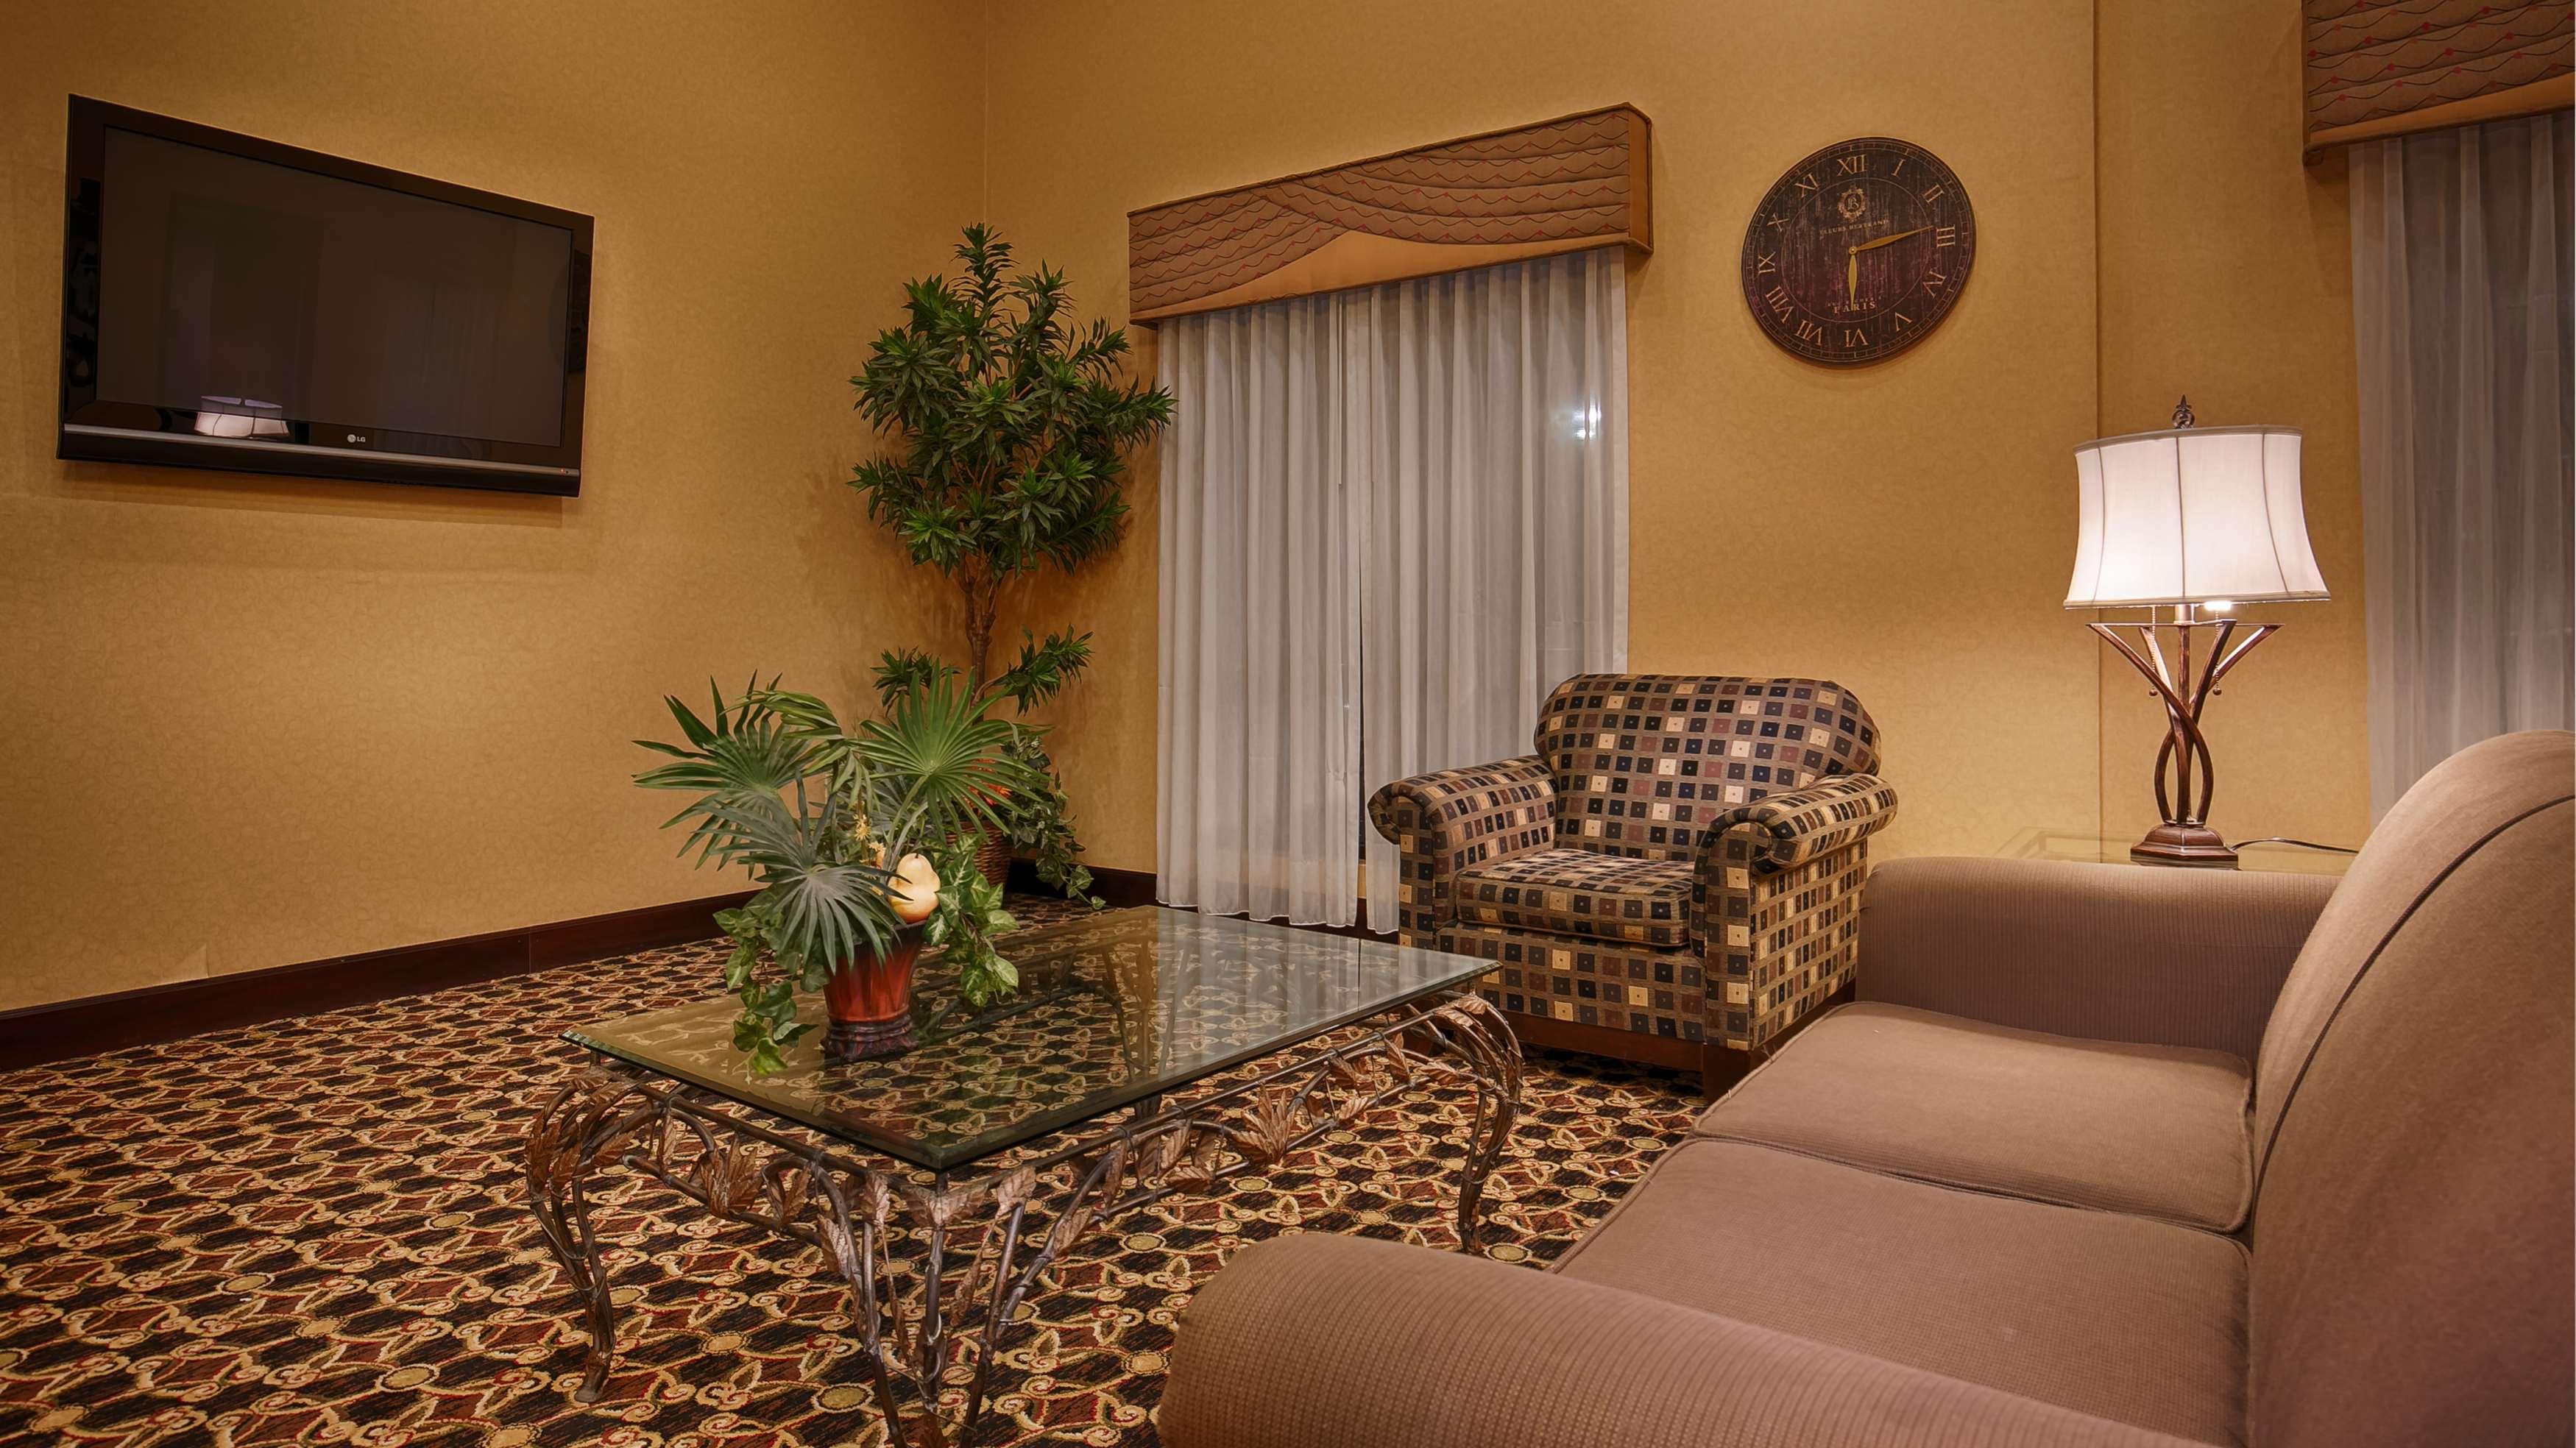 Best Western Plus Daphne Inn & Suites image 4